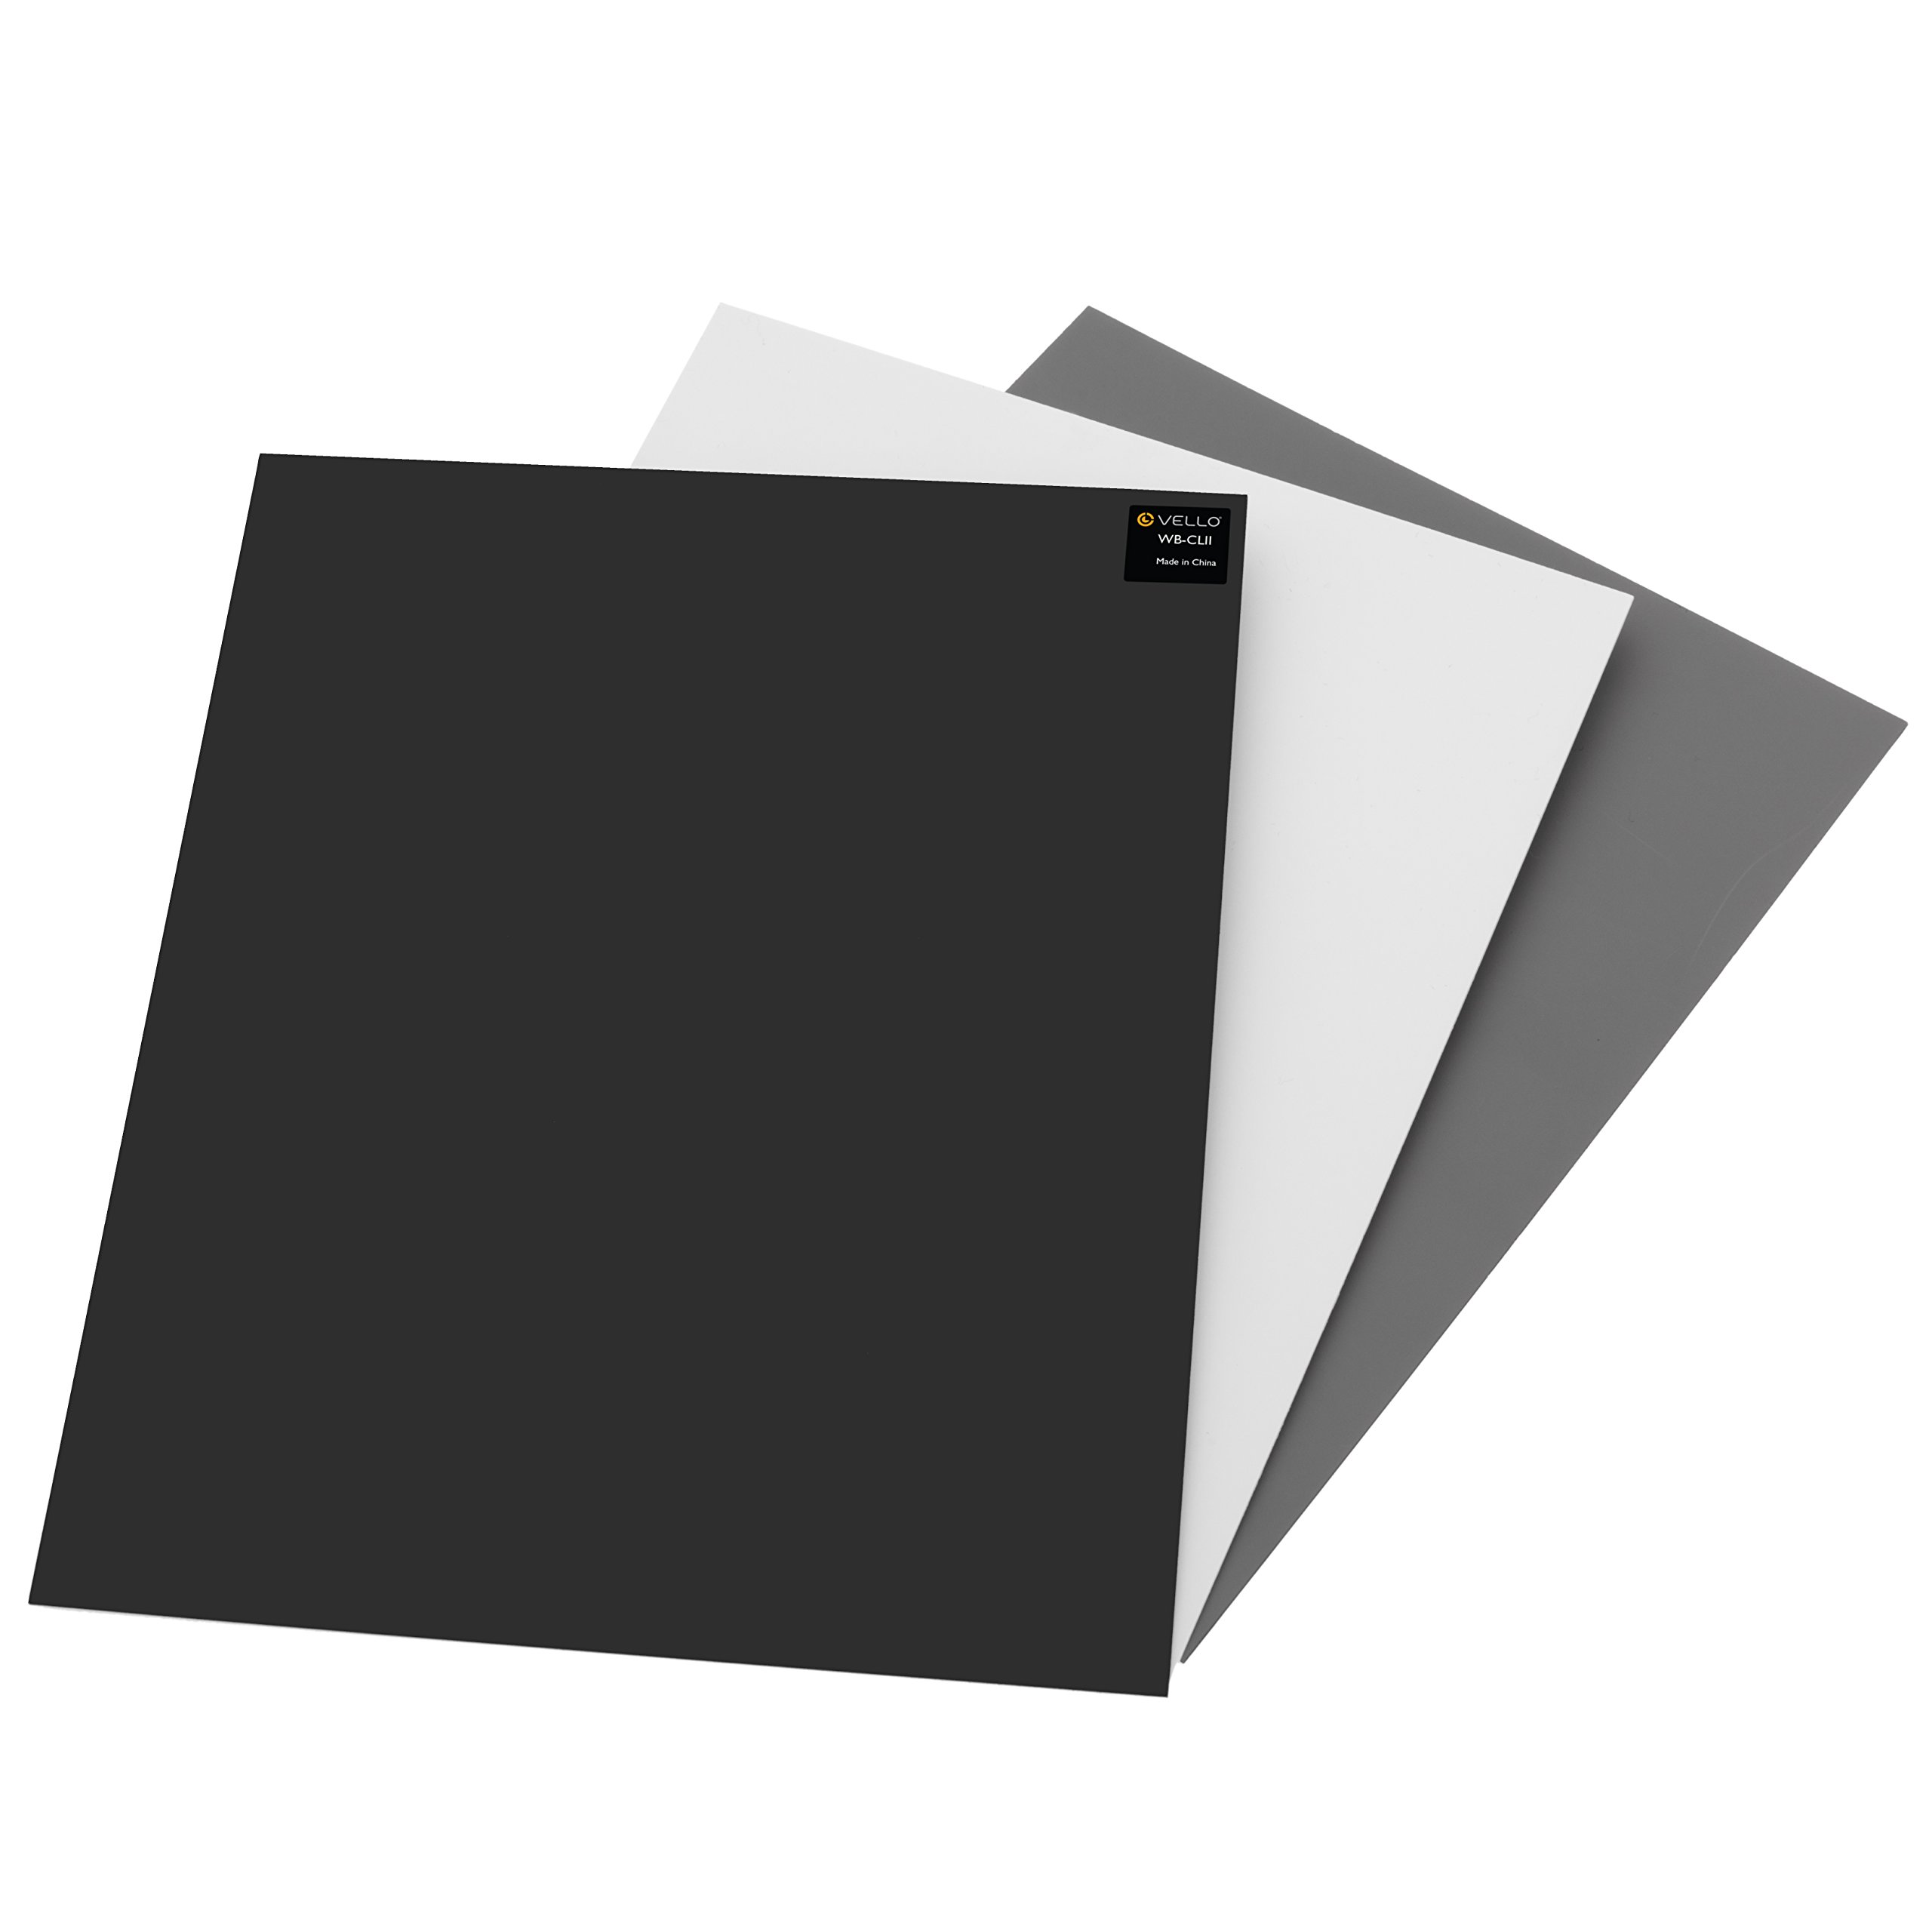 Vello White Balance Card Set (Large) by VELLO